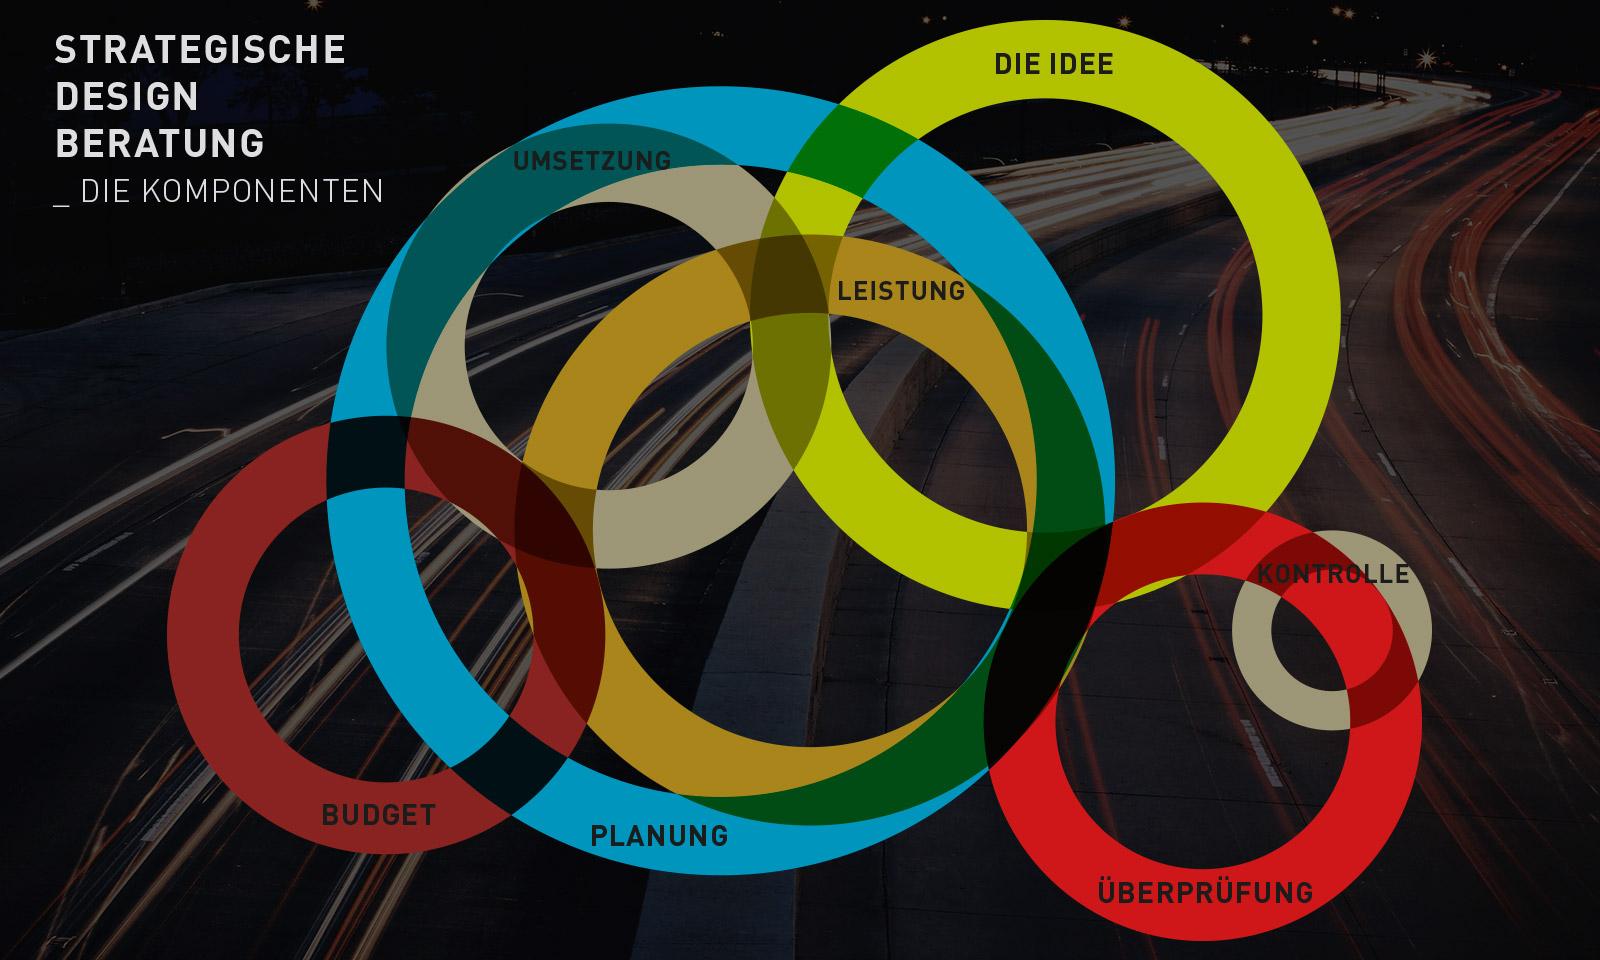 Strategische Design-Beratung